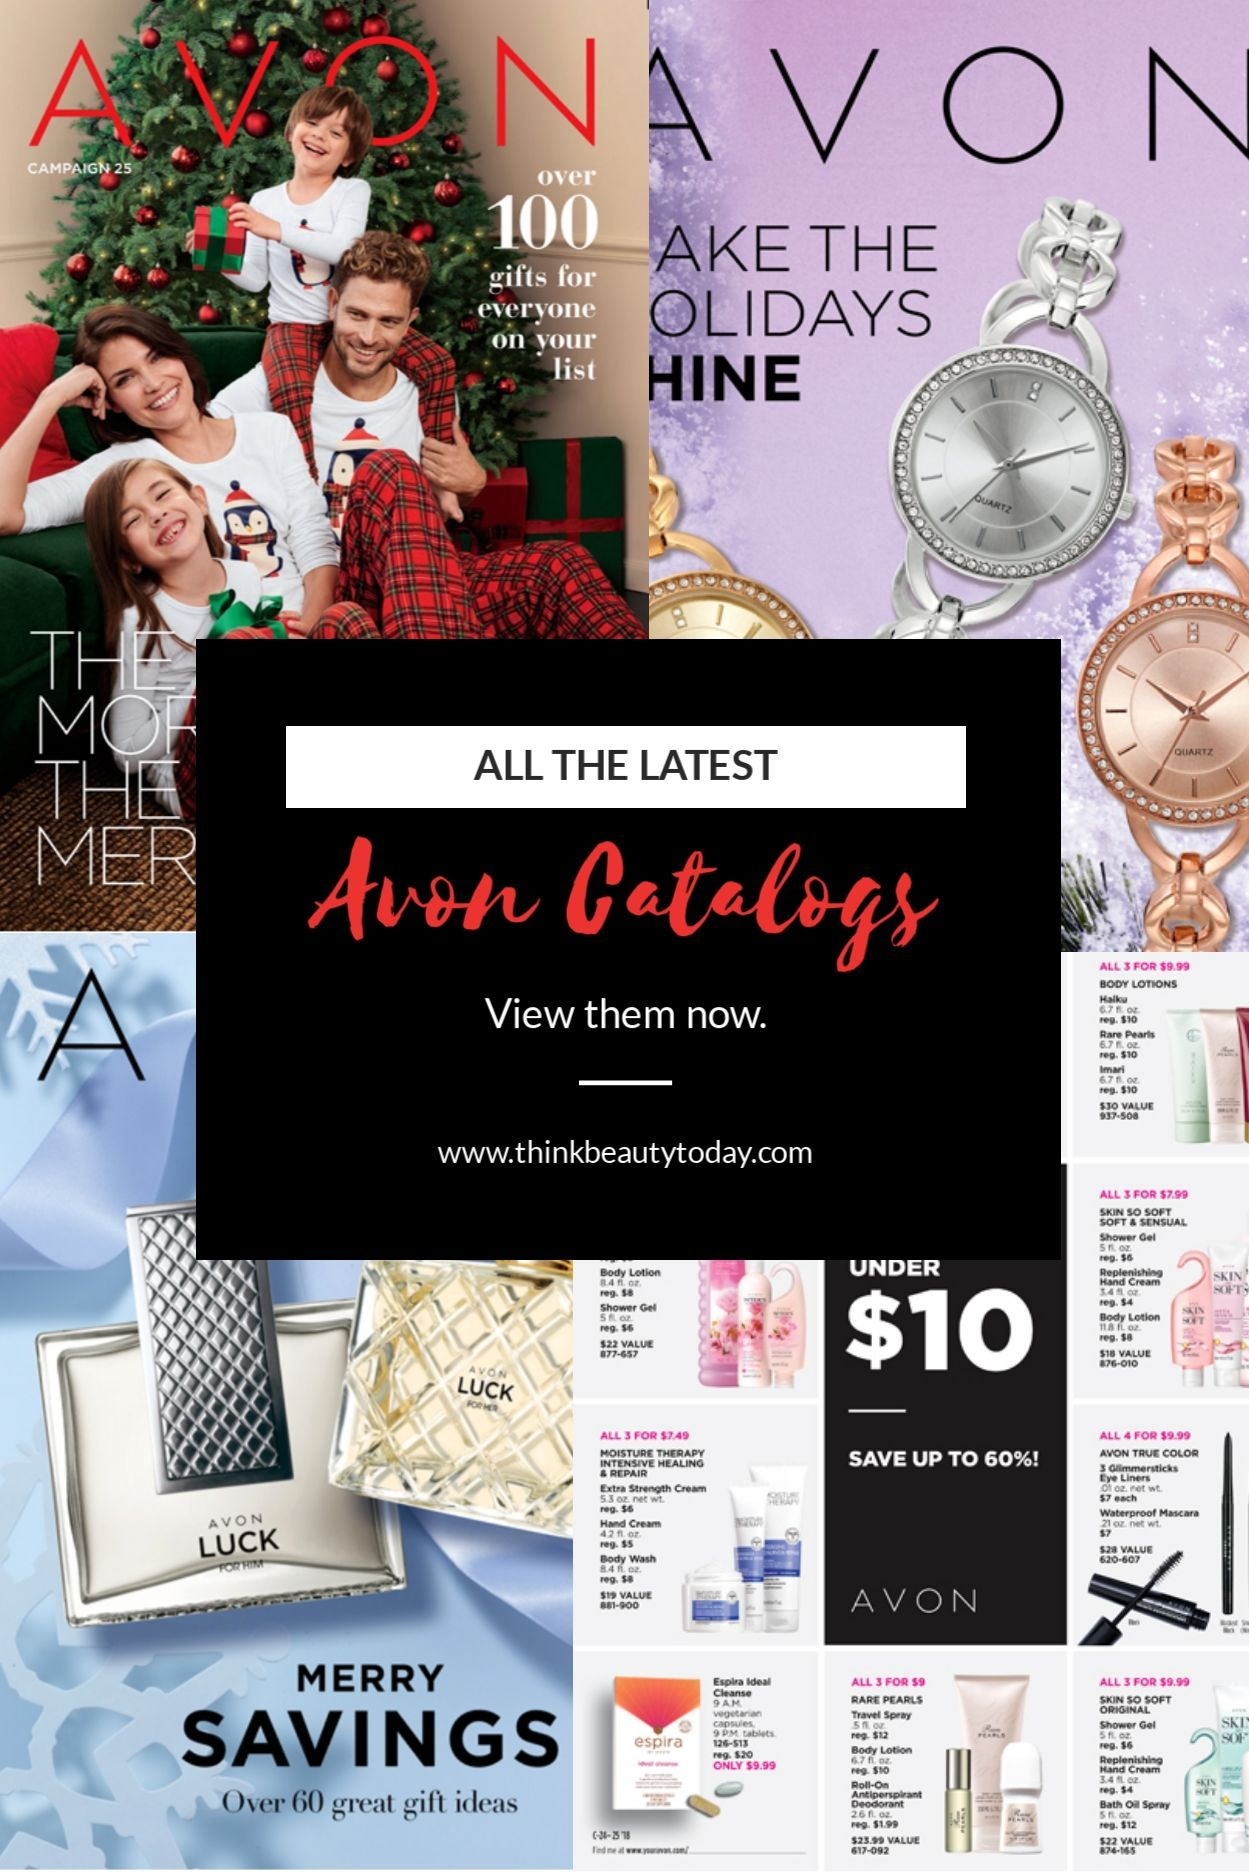 AVON CATALOG 2018• SHOP December 2018 Catalogs Online in 2018 | Avon ...